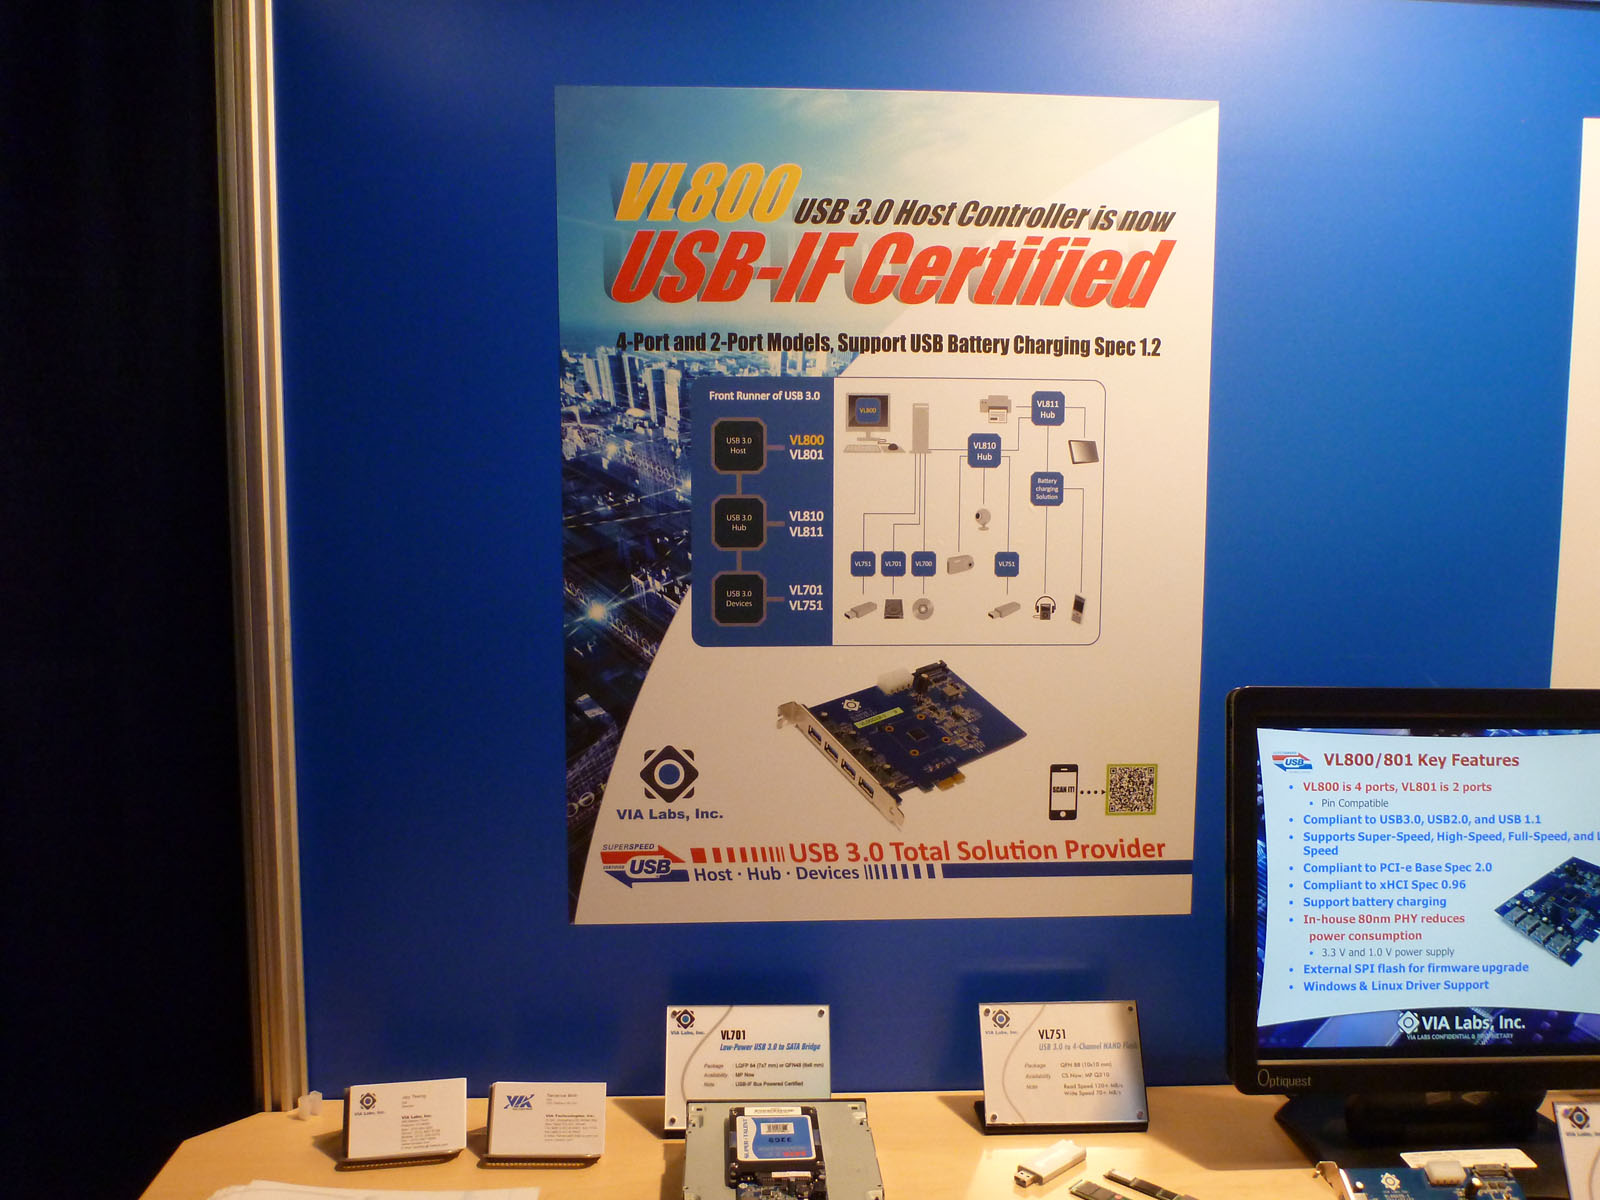 VIA Labs VL800/VL801 USB 3.0 Controller 64 BIT